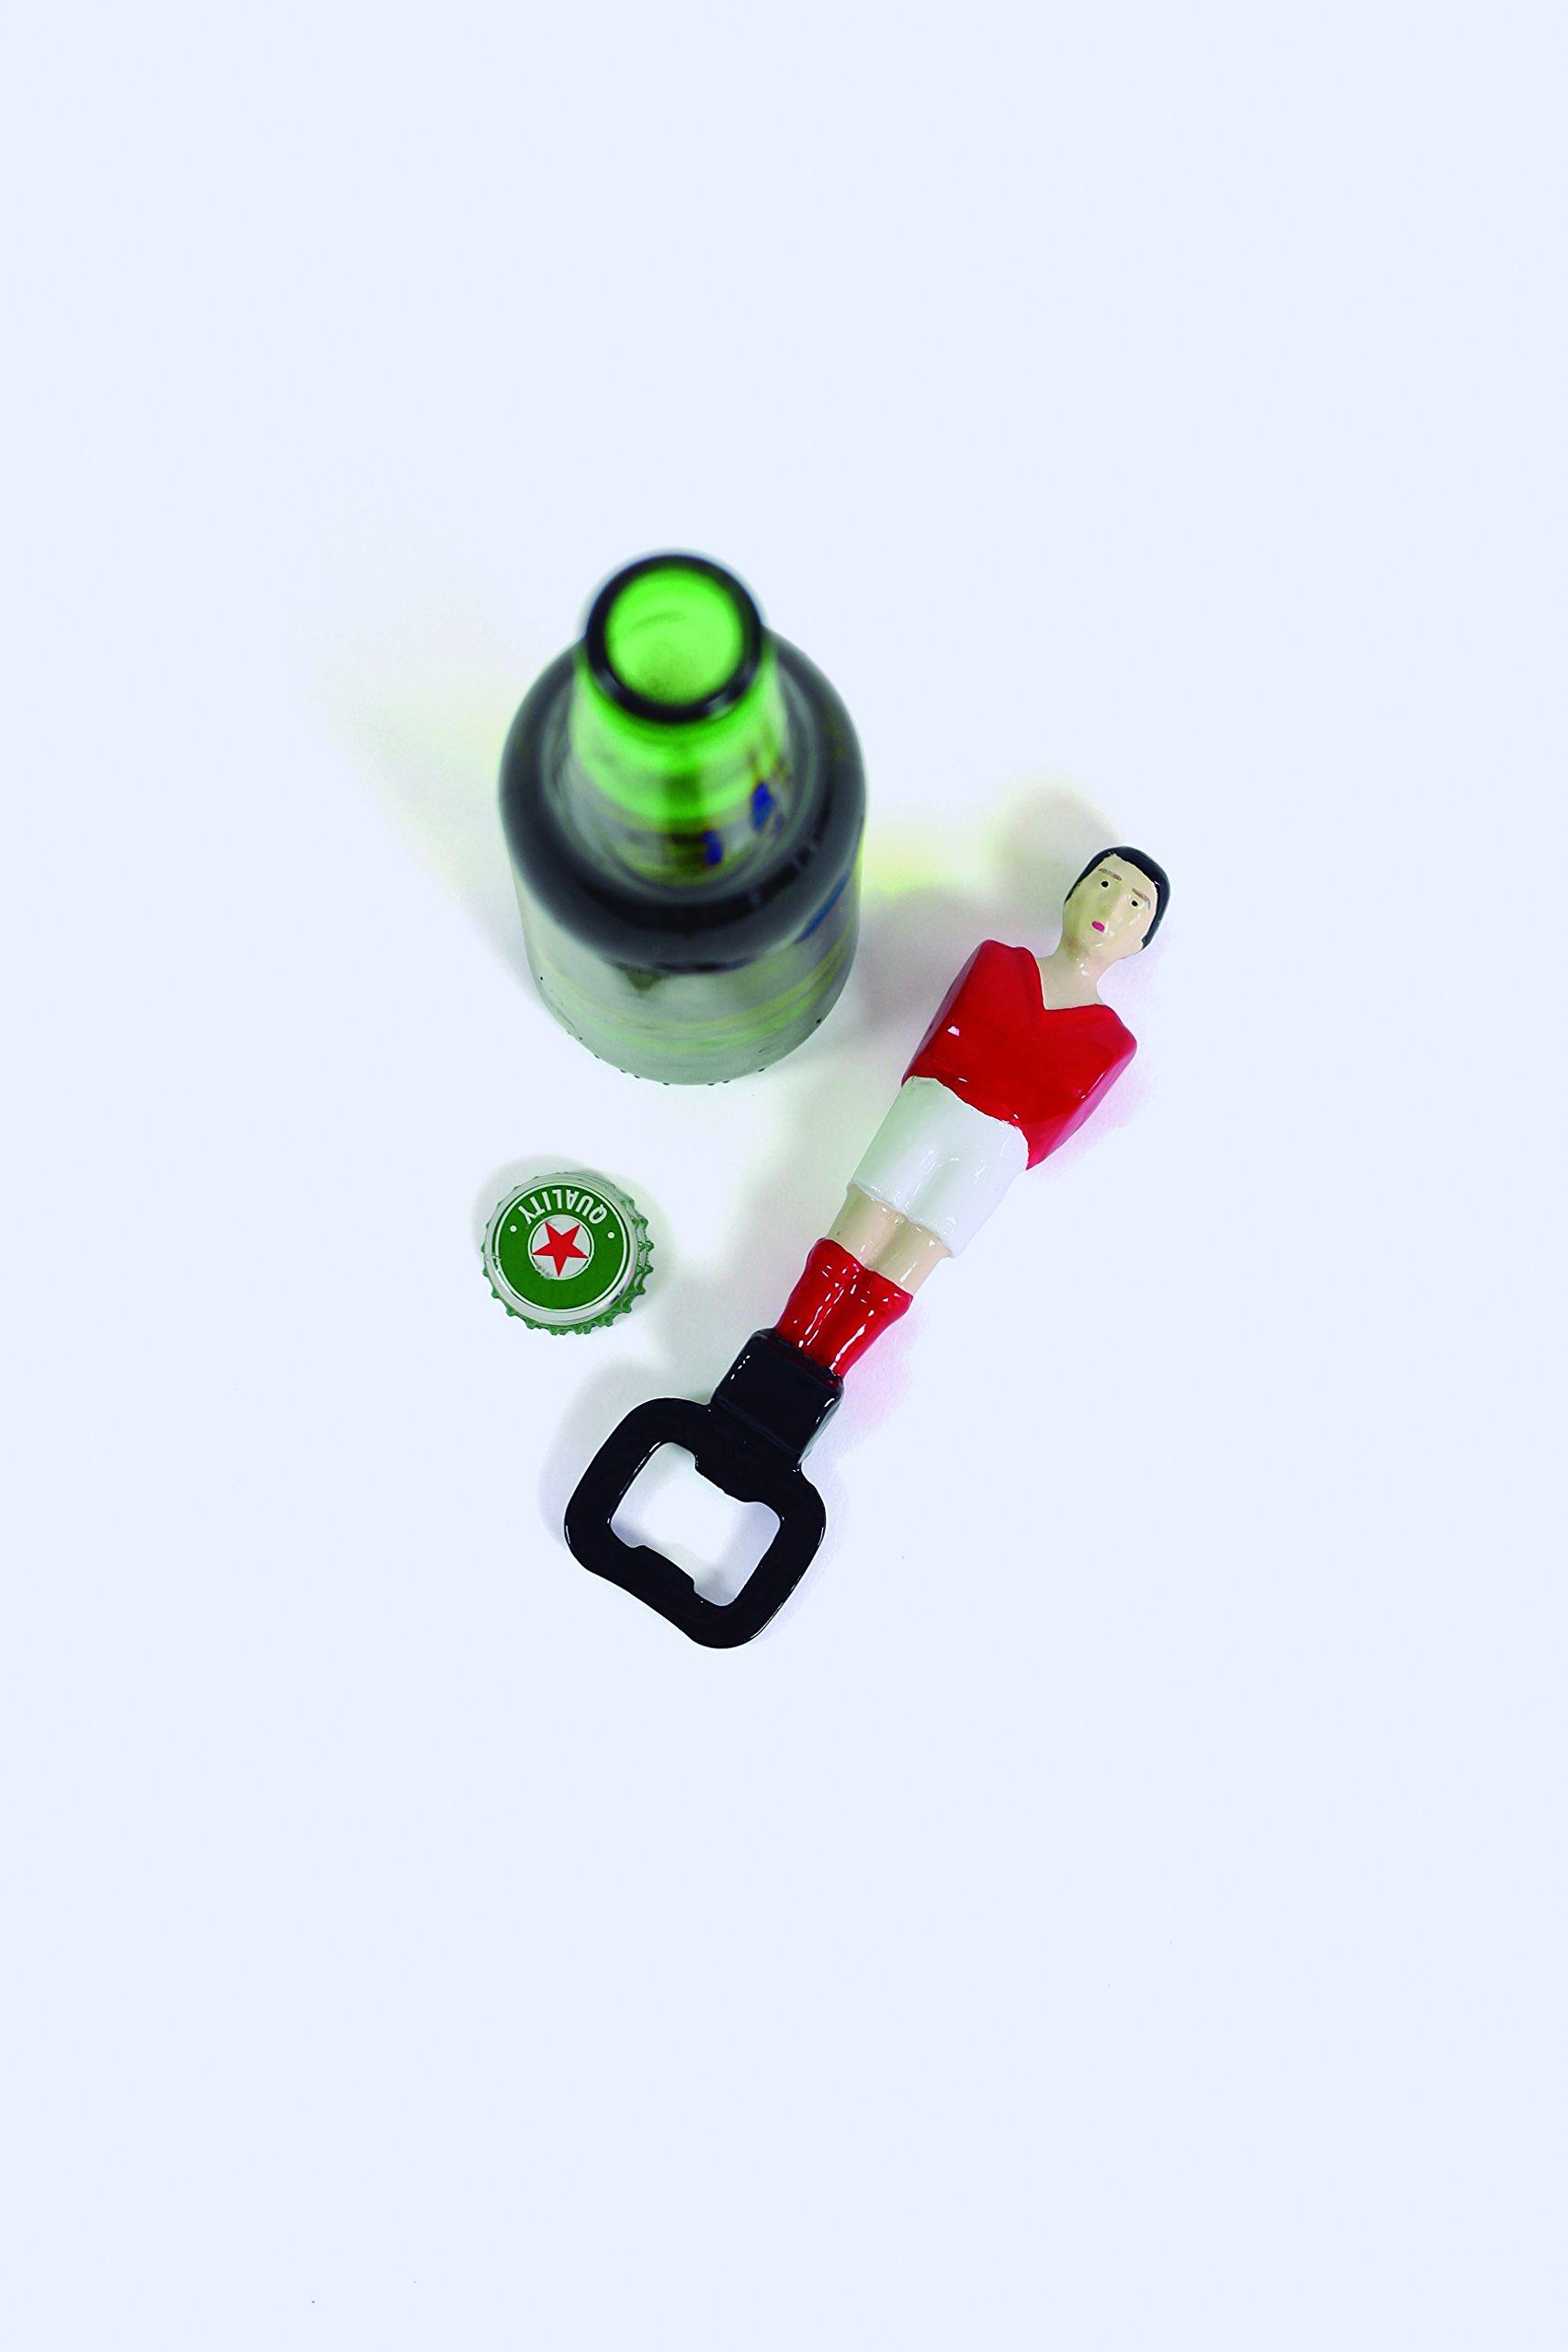 Doiy Abre Botellas, Negro, Centimeters: Amazon.es: Hogar